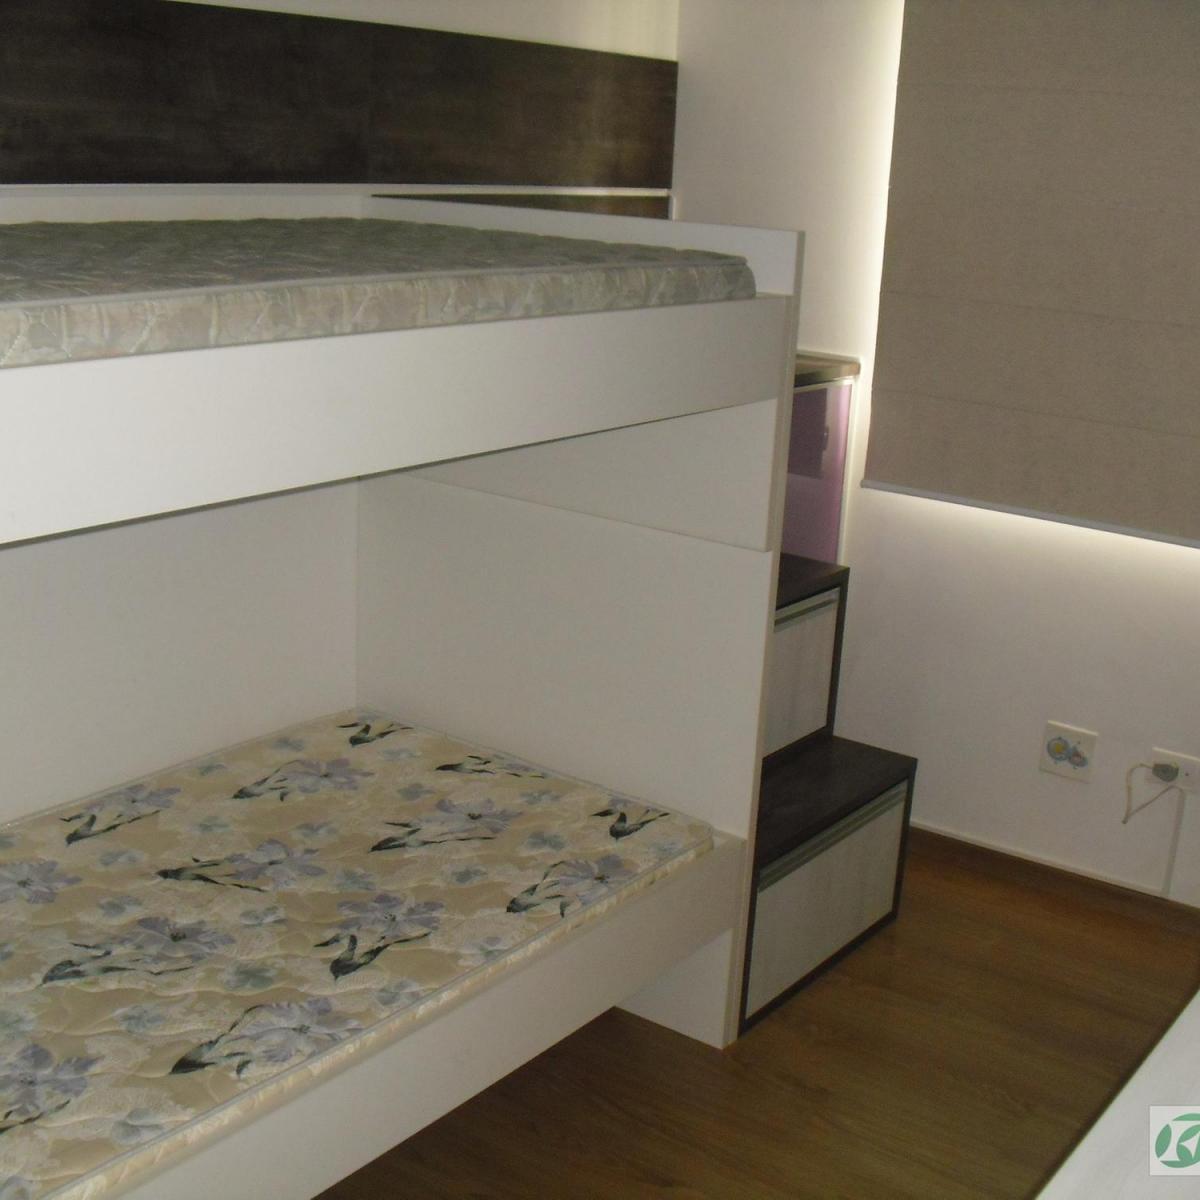 Comprido Curitiba R$ 1.200 6800 m2 ID: 2930503868 Imovelweb #382F1F 1200x1200 Balcão Banheiro Curitiba